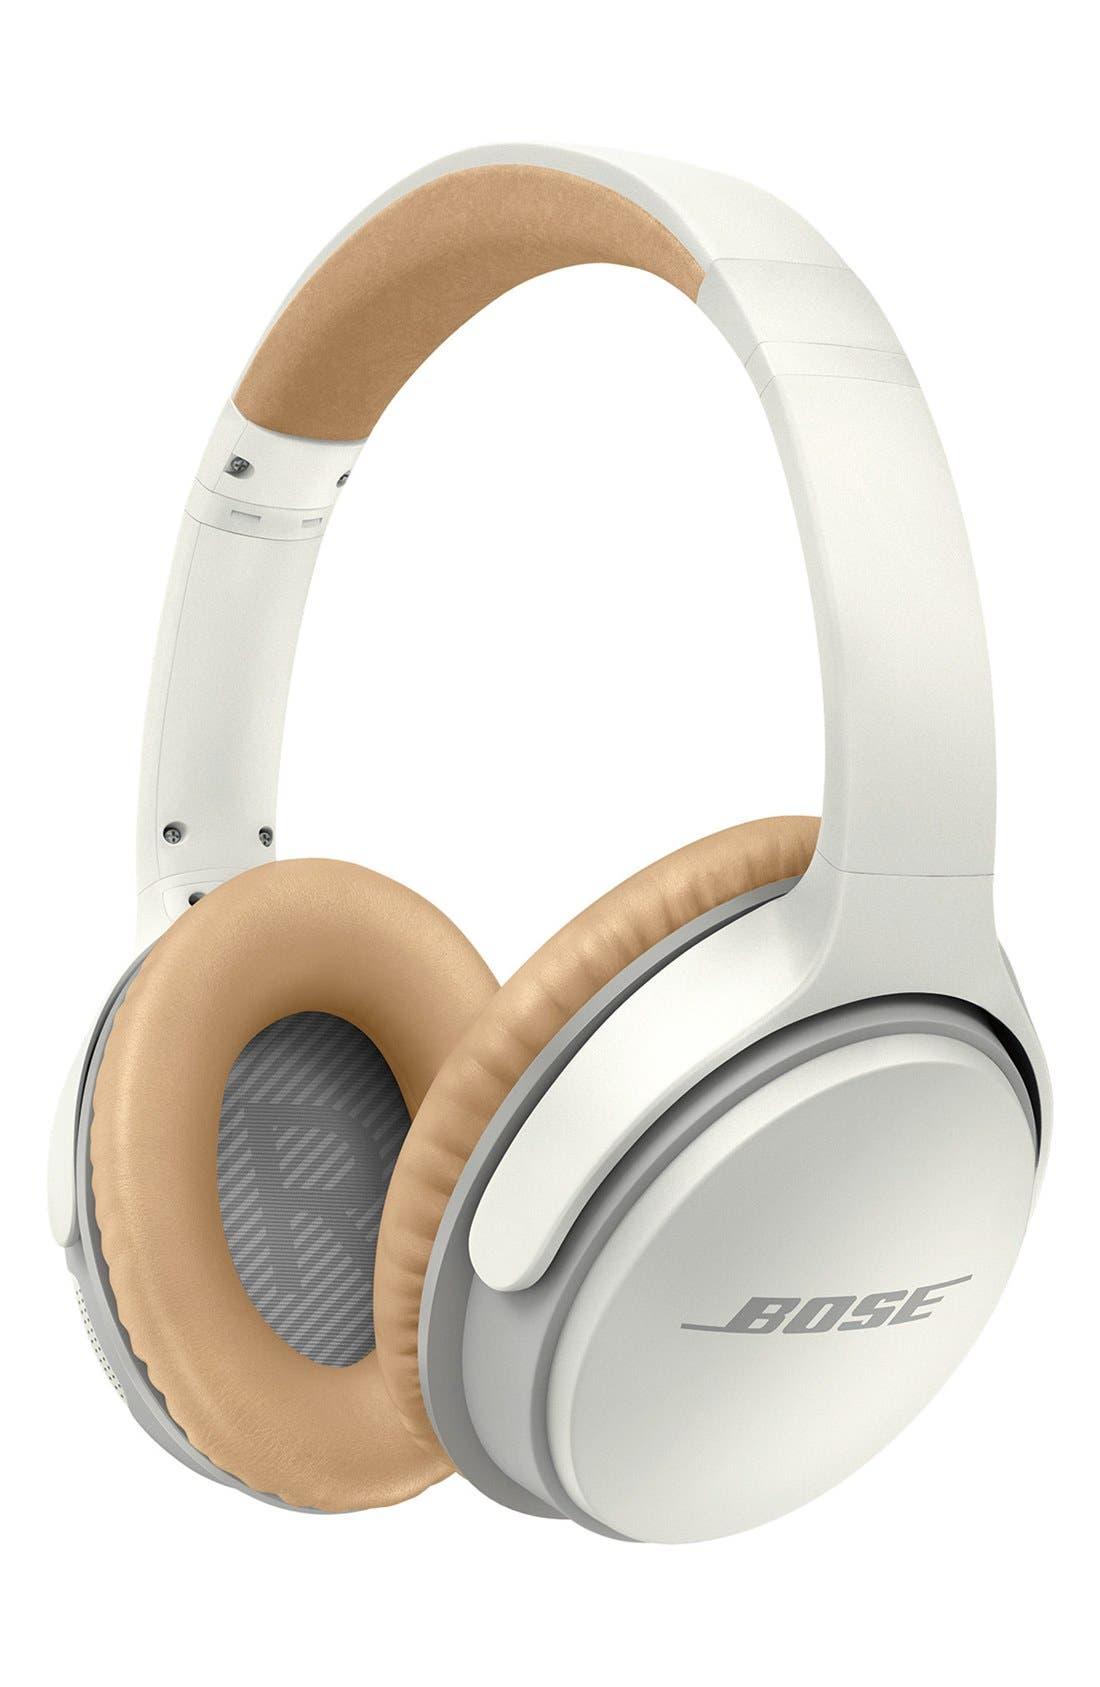 Bose® SoundLink® II Around-Ear Bluetooth® Headphones